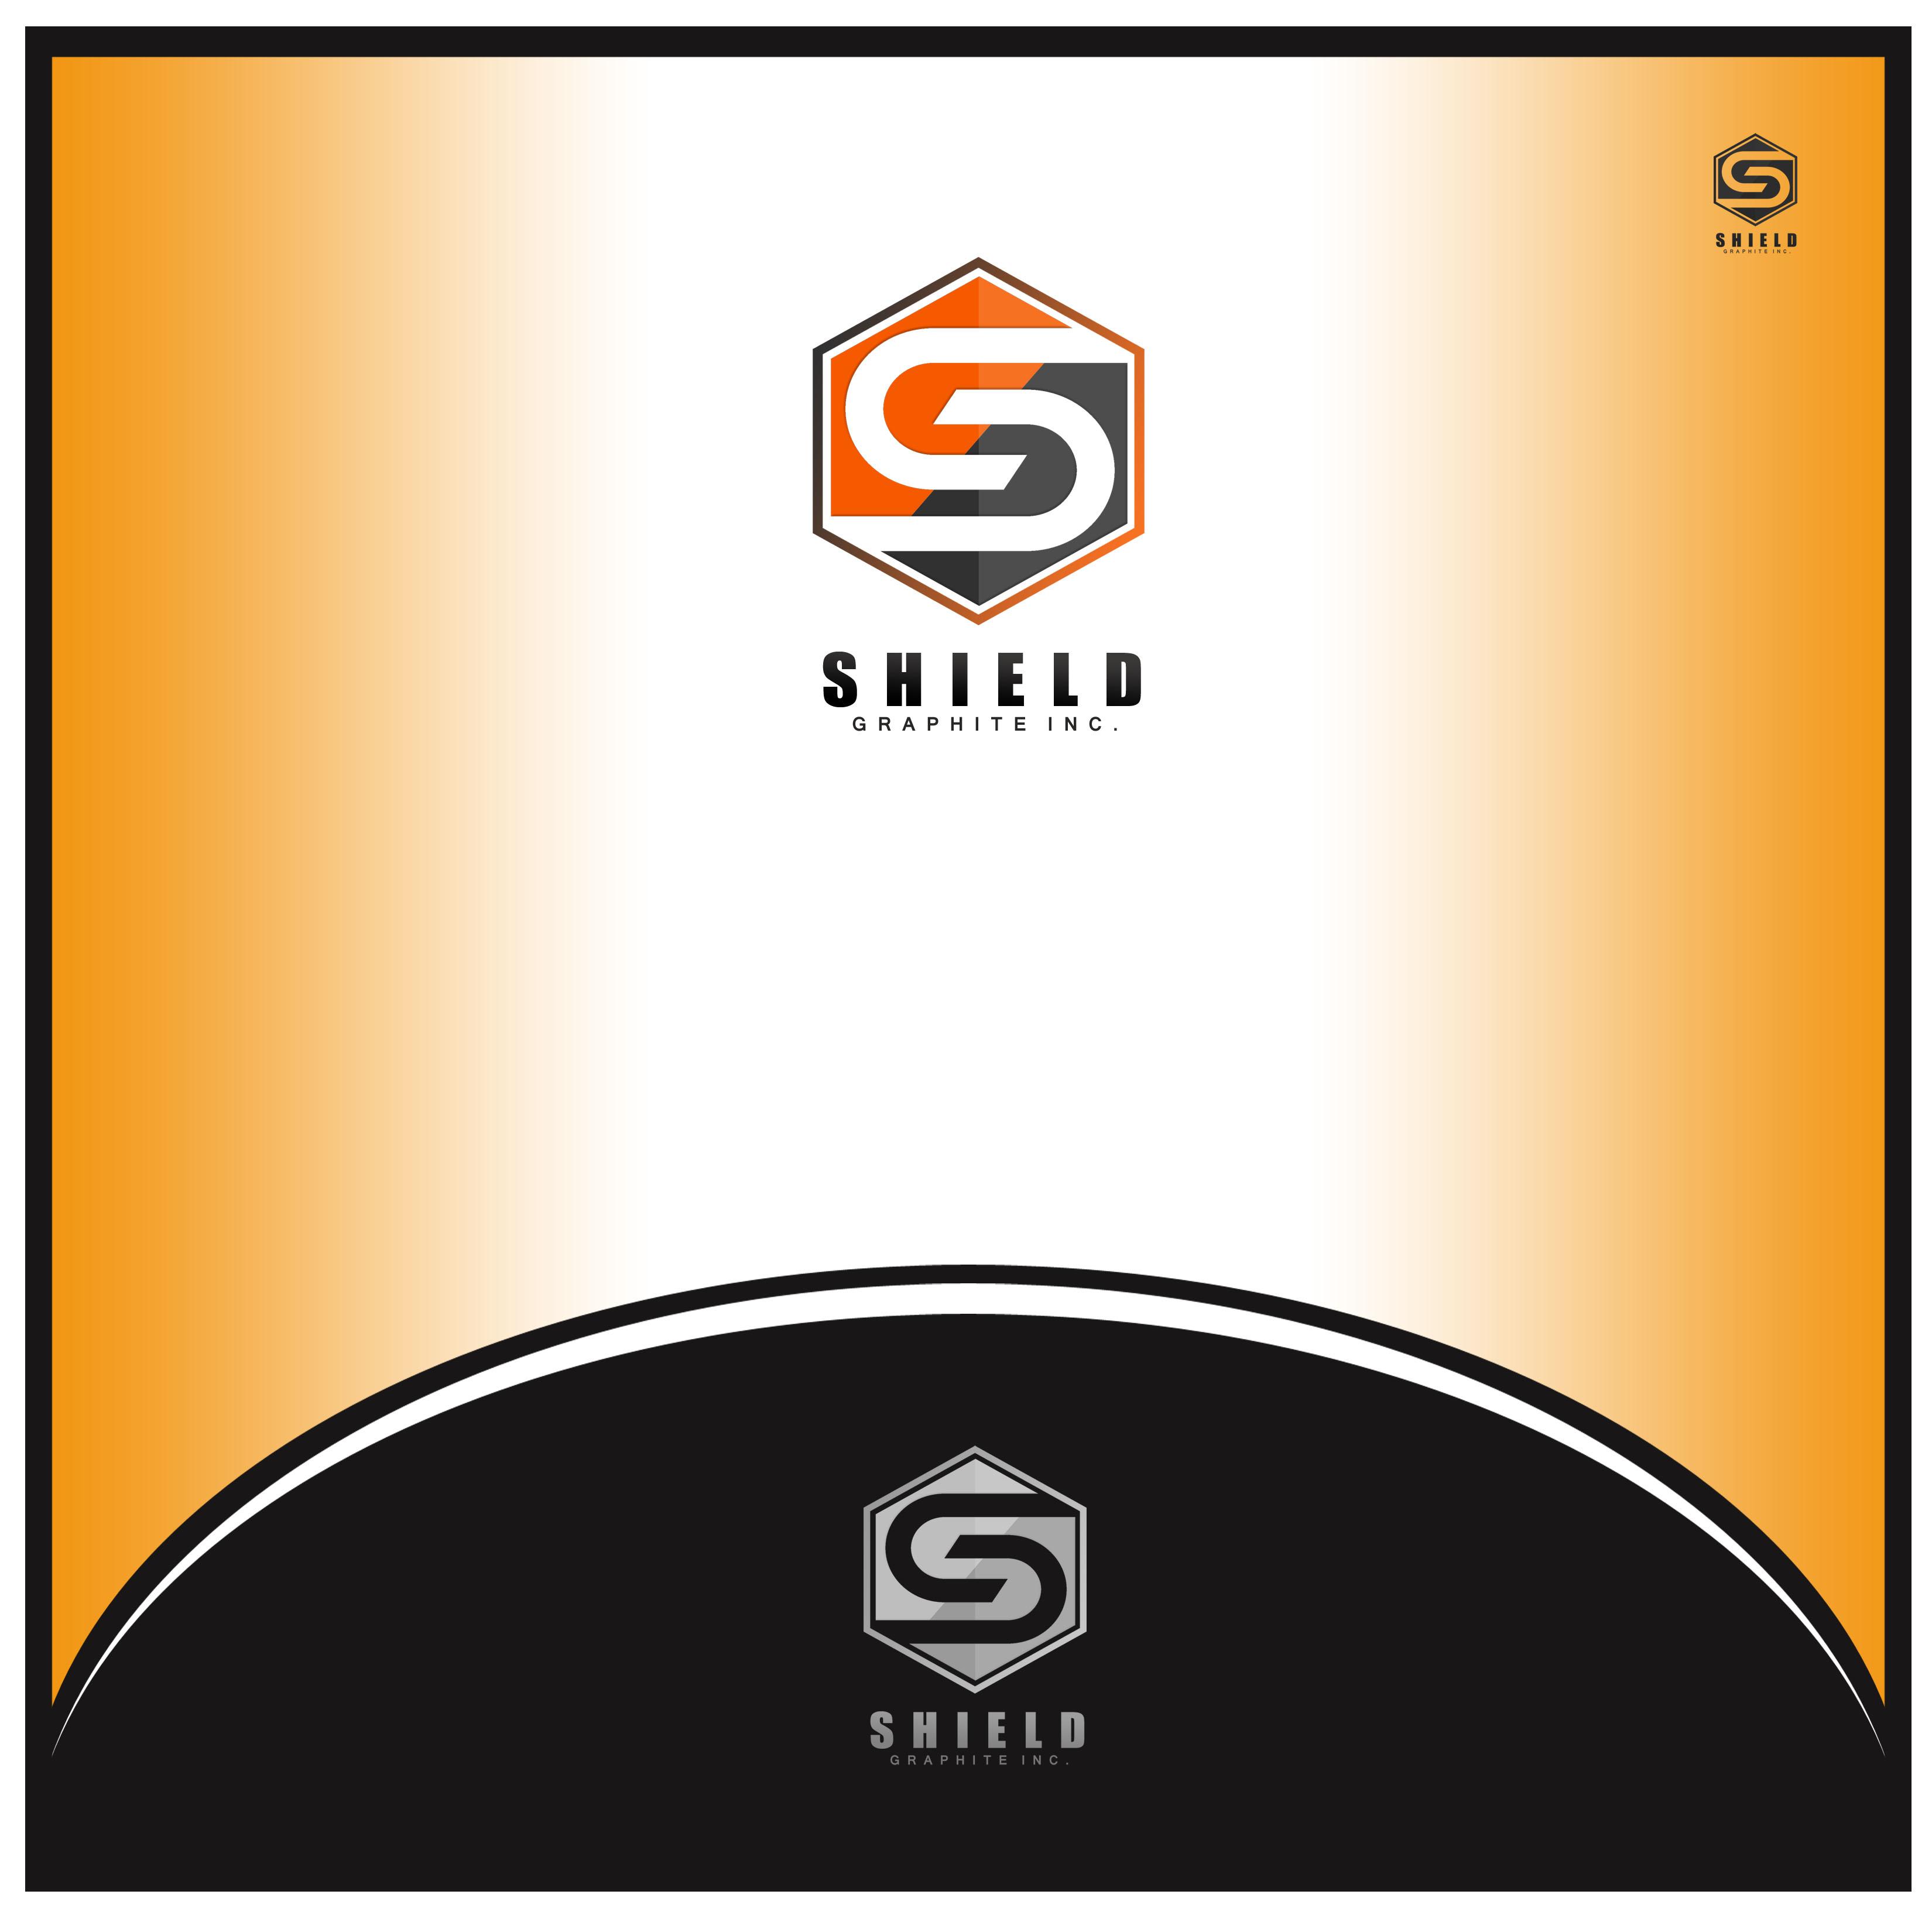 Logo Design by Allan Esclamado - Entry No. 58 in the Logo Design Contest Imaginative Logo Design for Shield Graphite Inc..